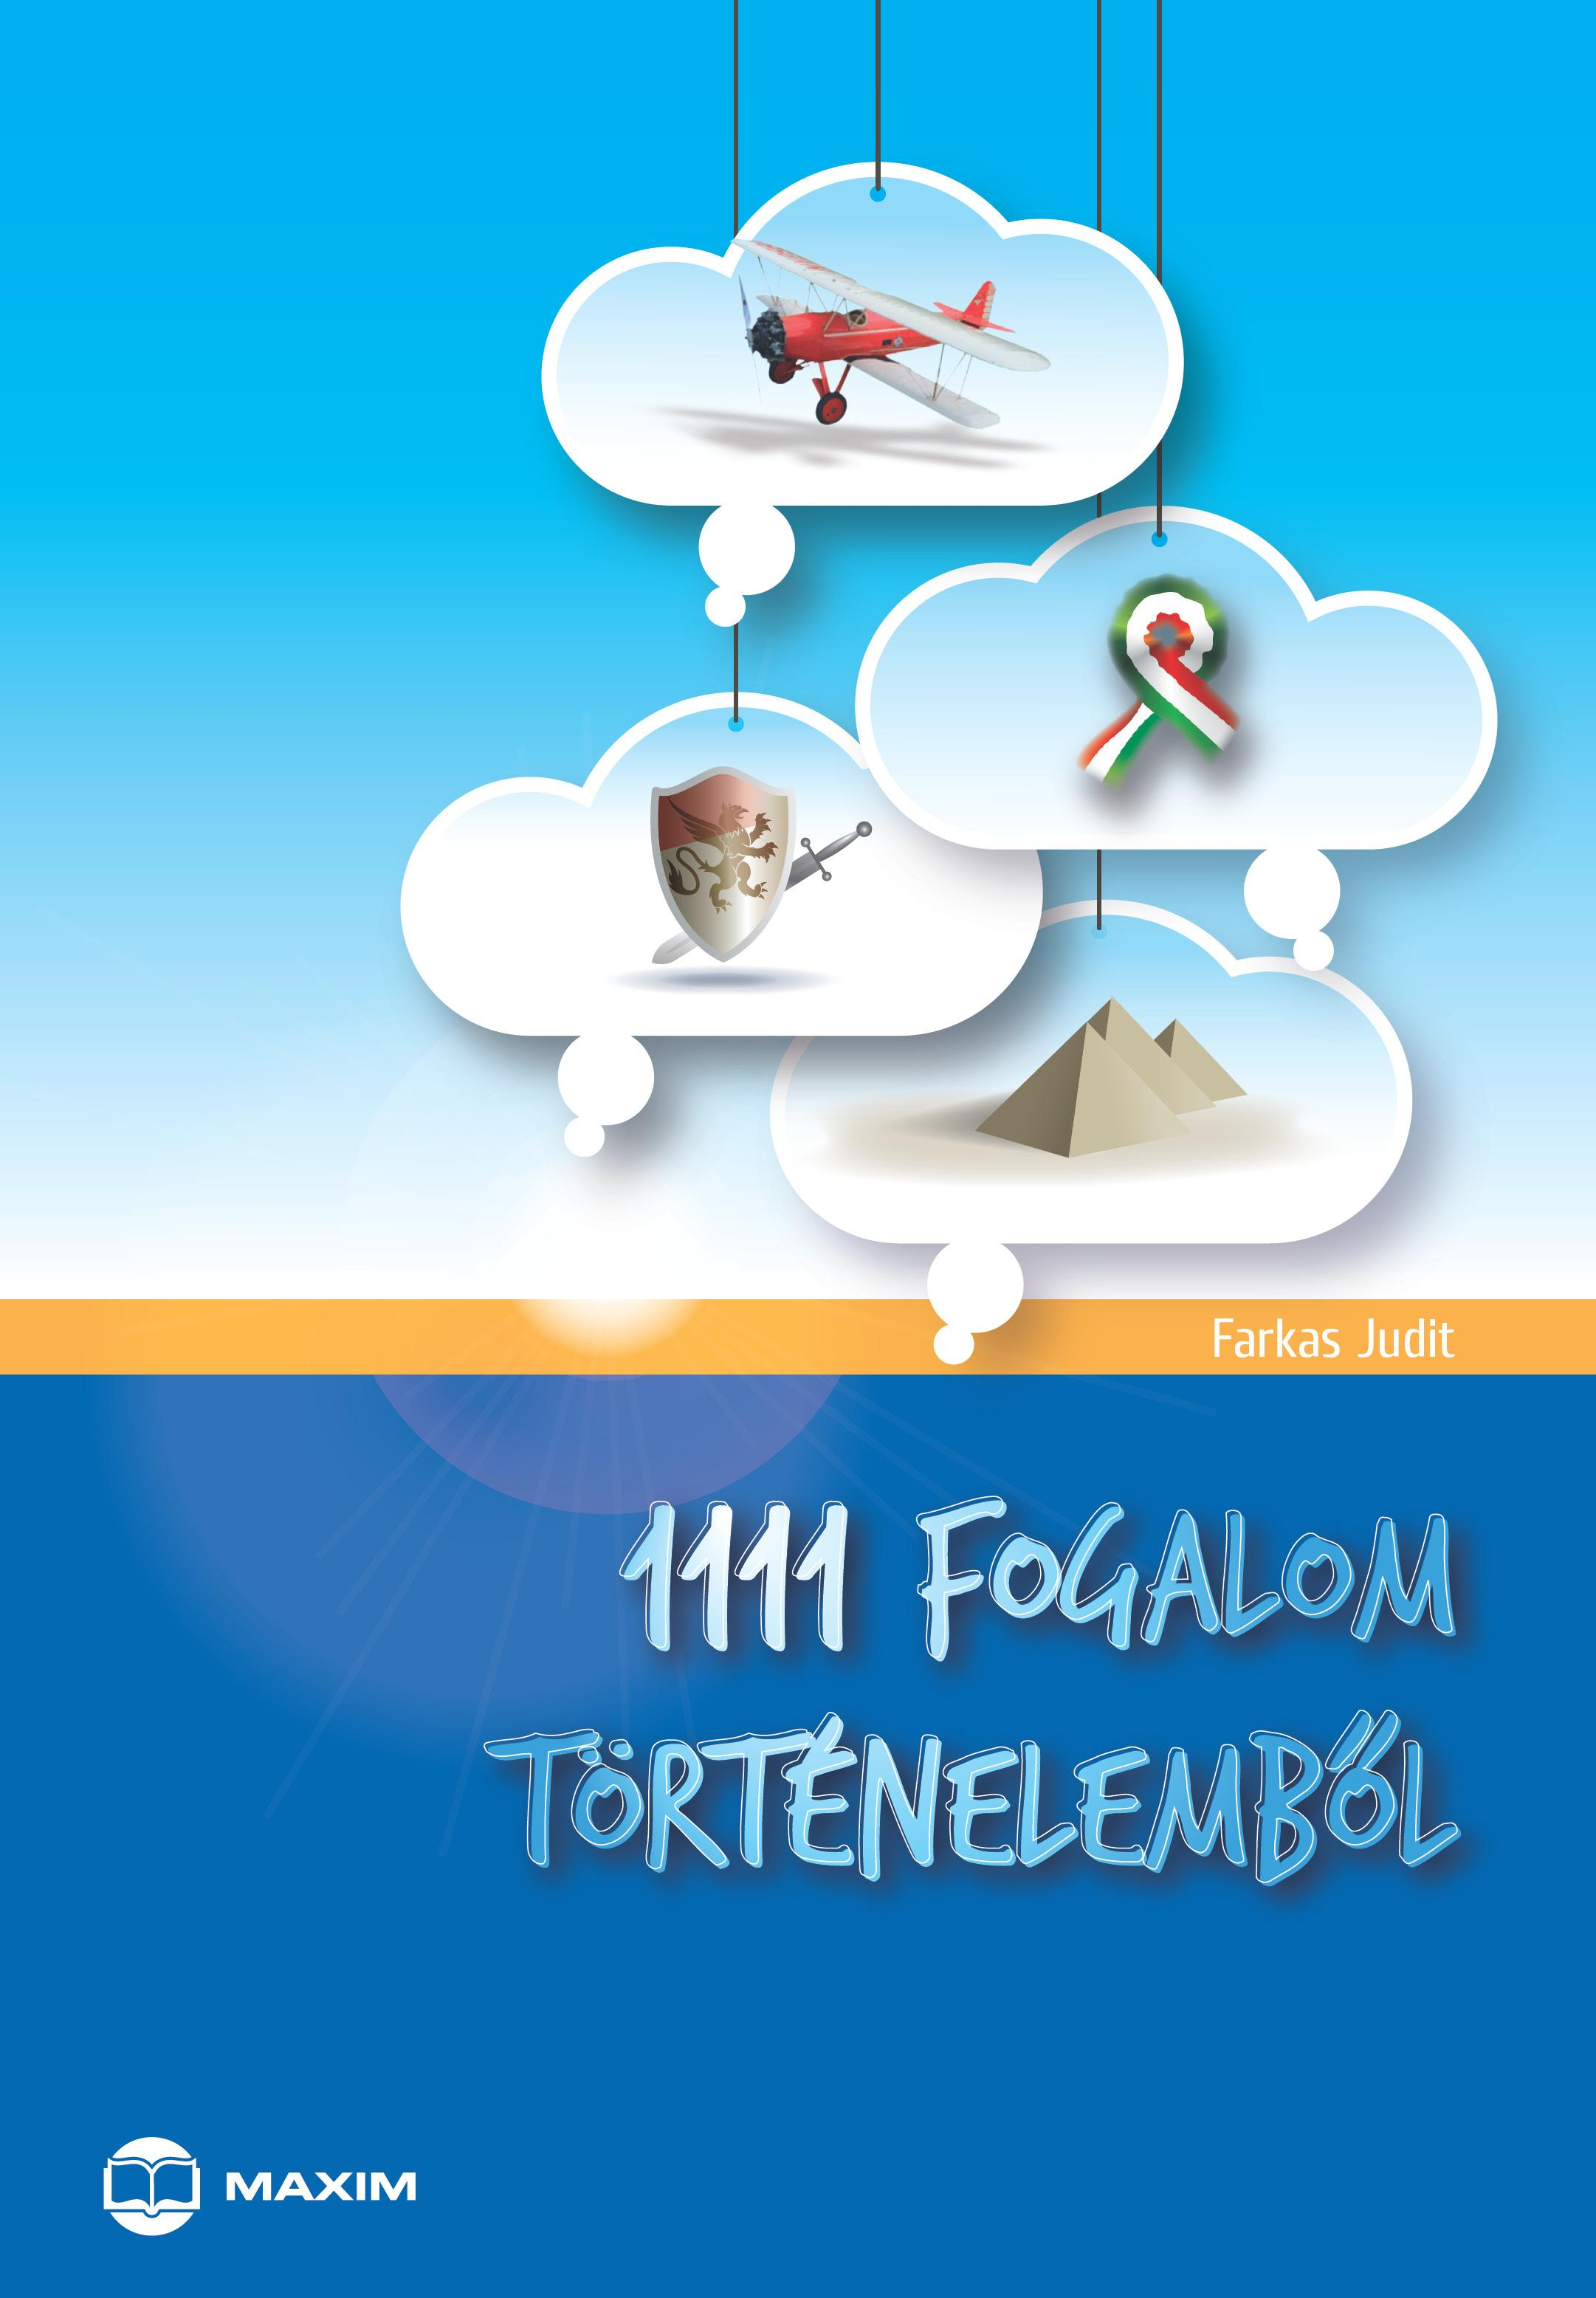 FARKAS JUDIT - 1111 FOGALOM TÖRTÉNELEMBŐL